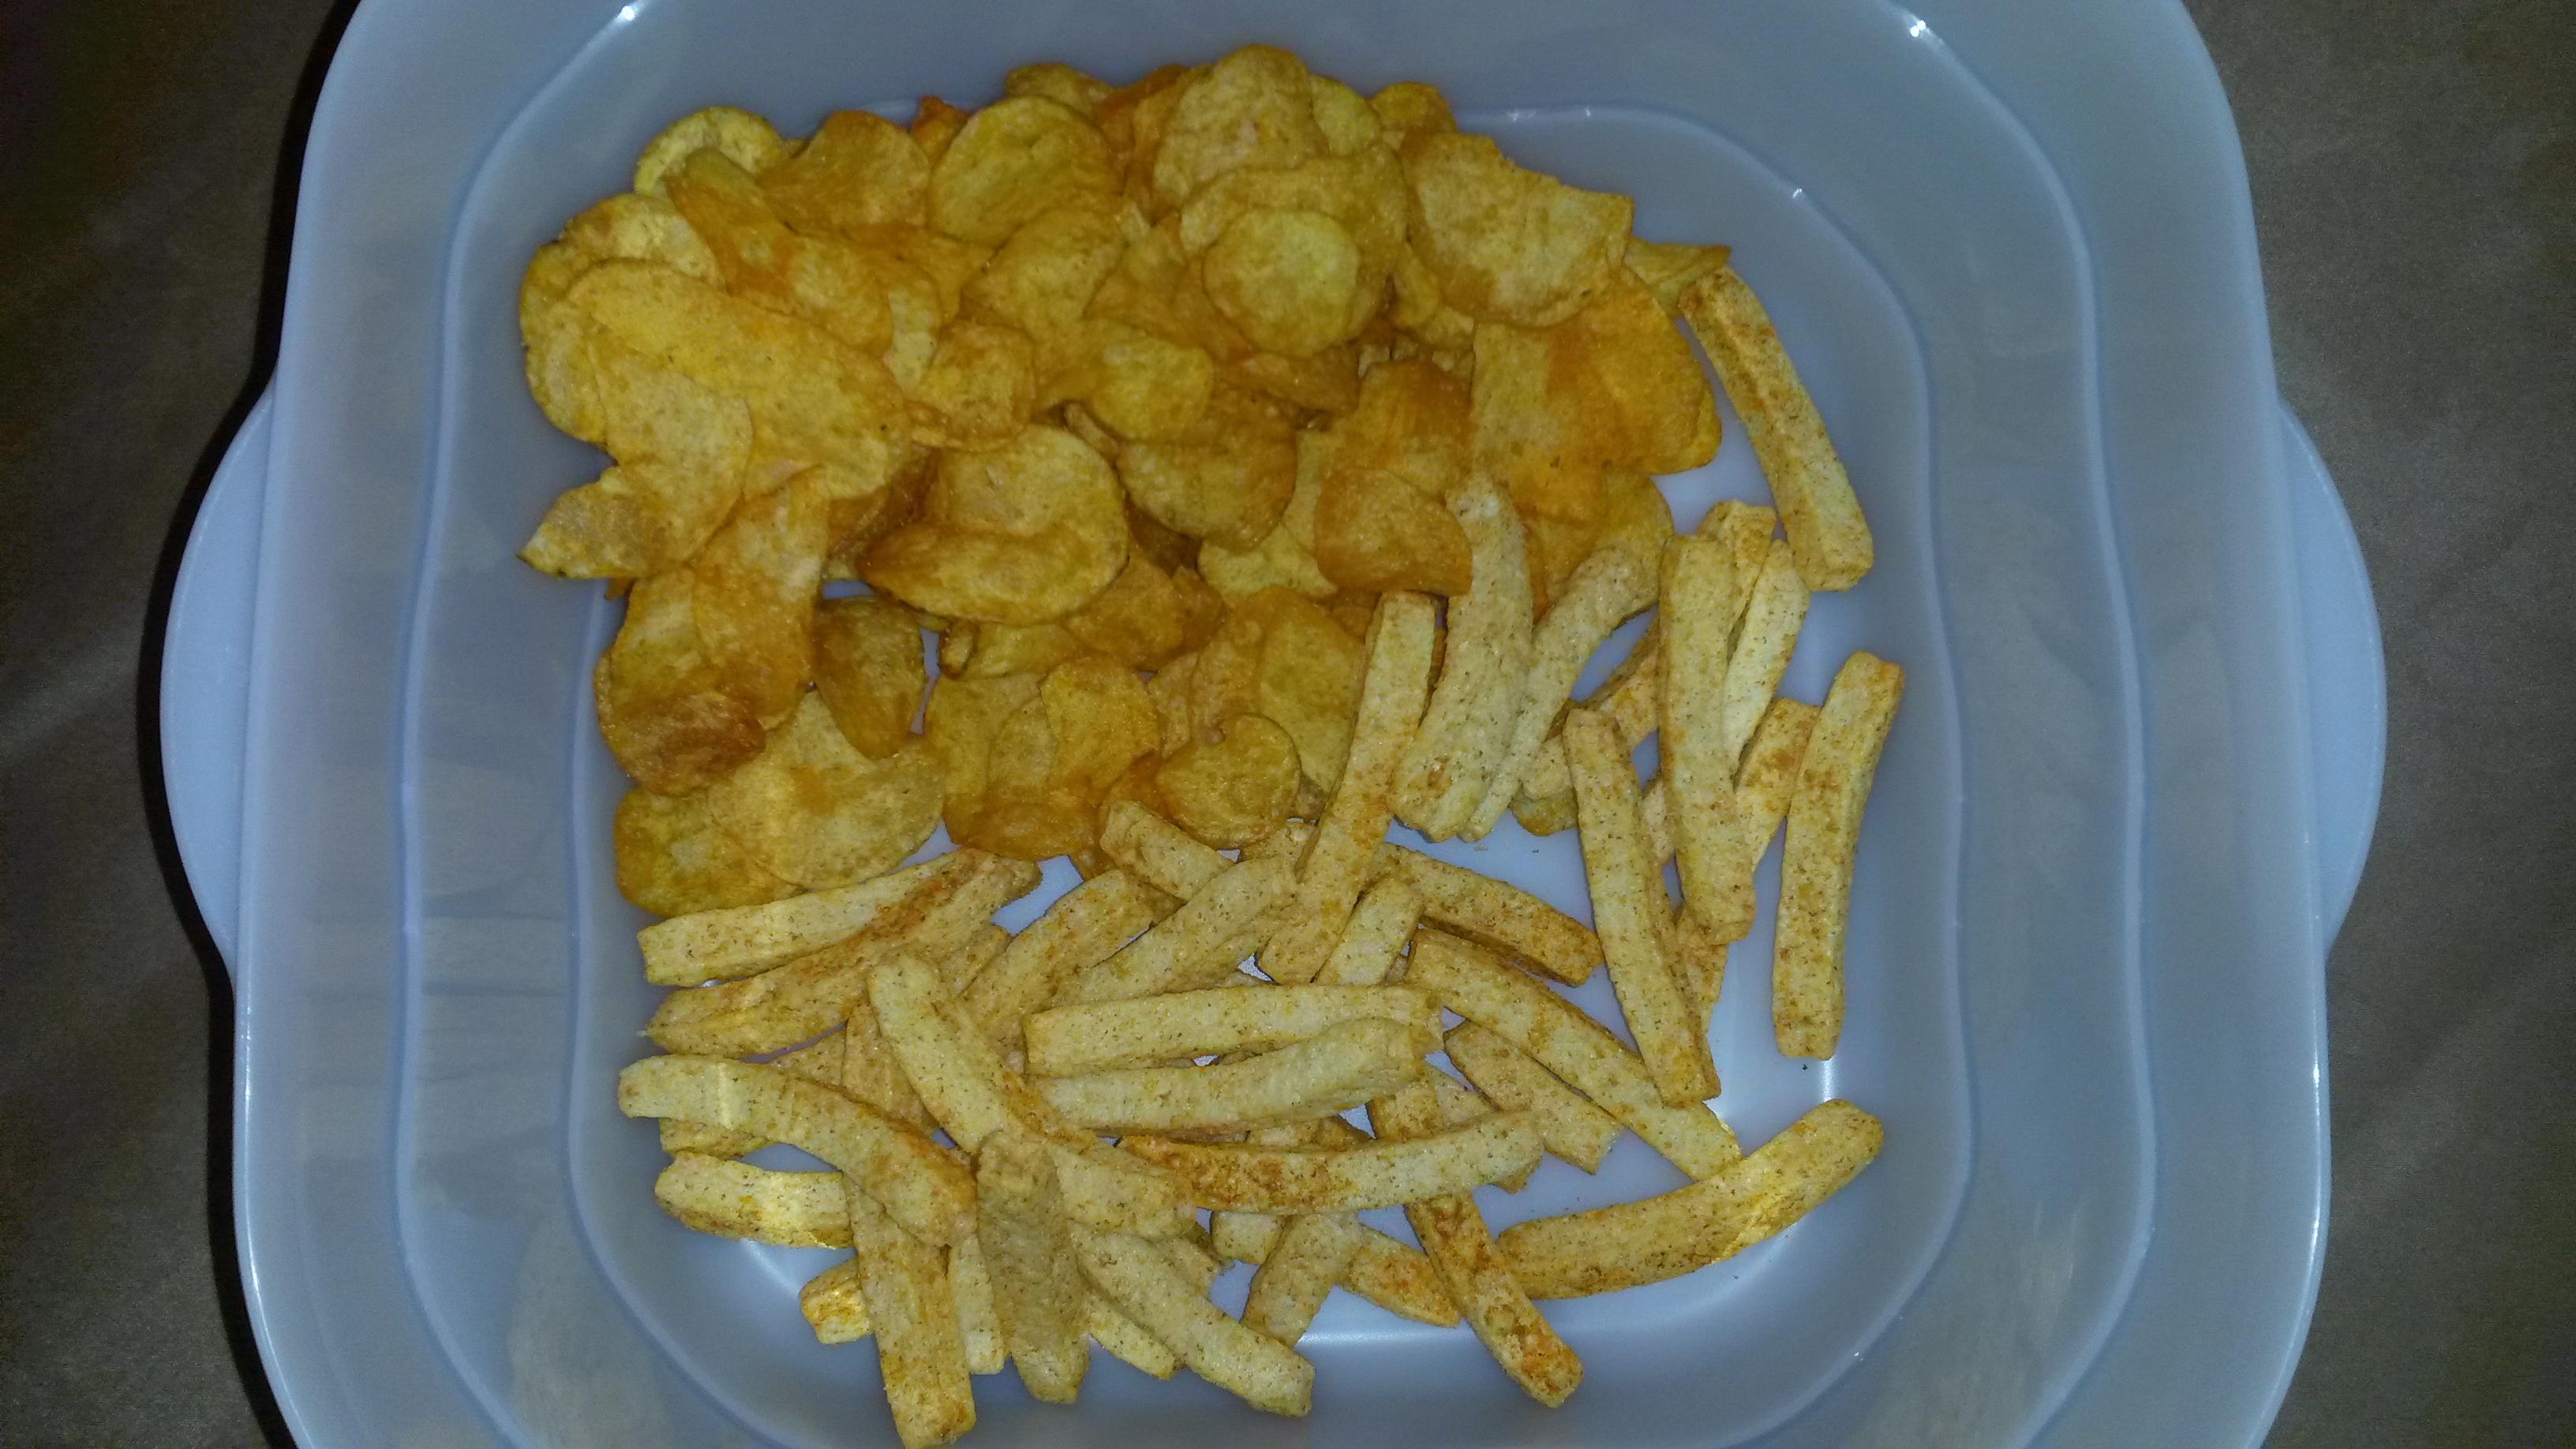 http://foodloader.net/sk0r_2013-12-24_Chips.jpg